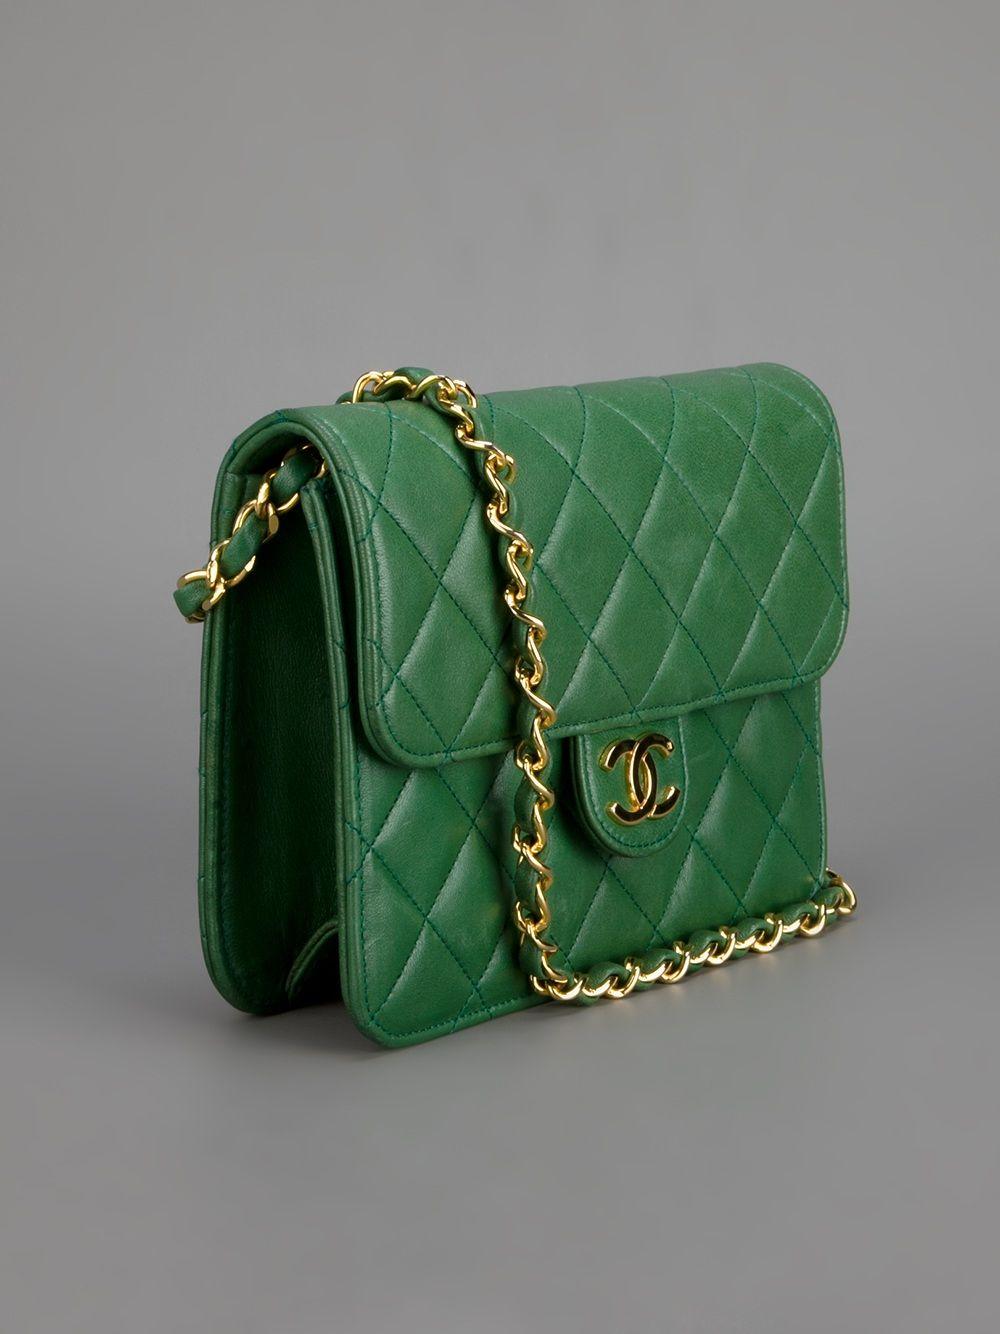 715717e7c79337 Chanel Vintage Quilted Leather Shoulder Bag - Rewind Vintage Affairs -  farfetch.com New Handbags